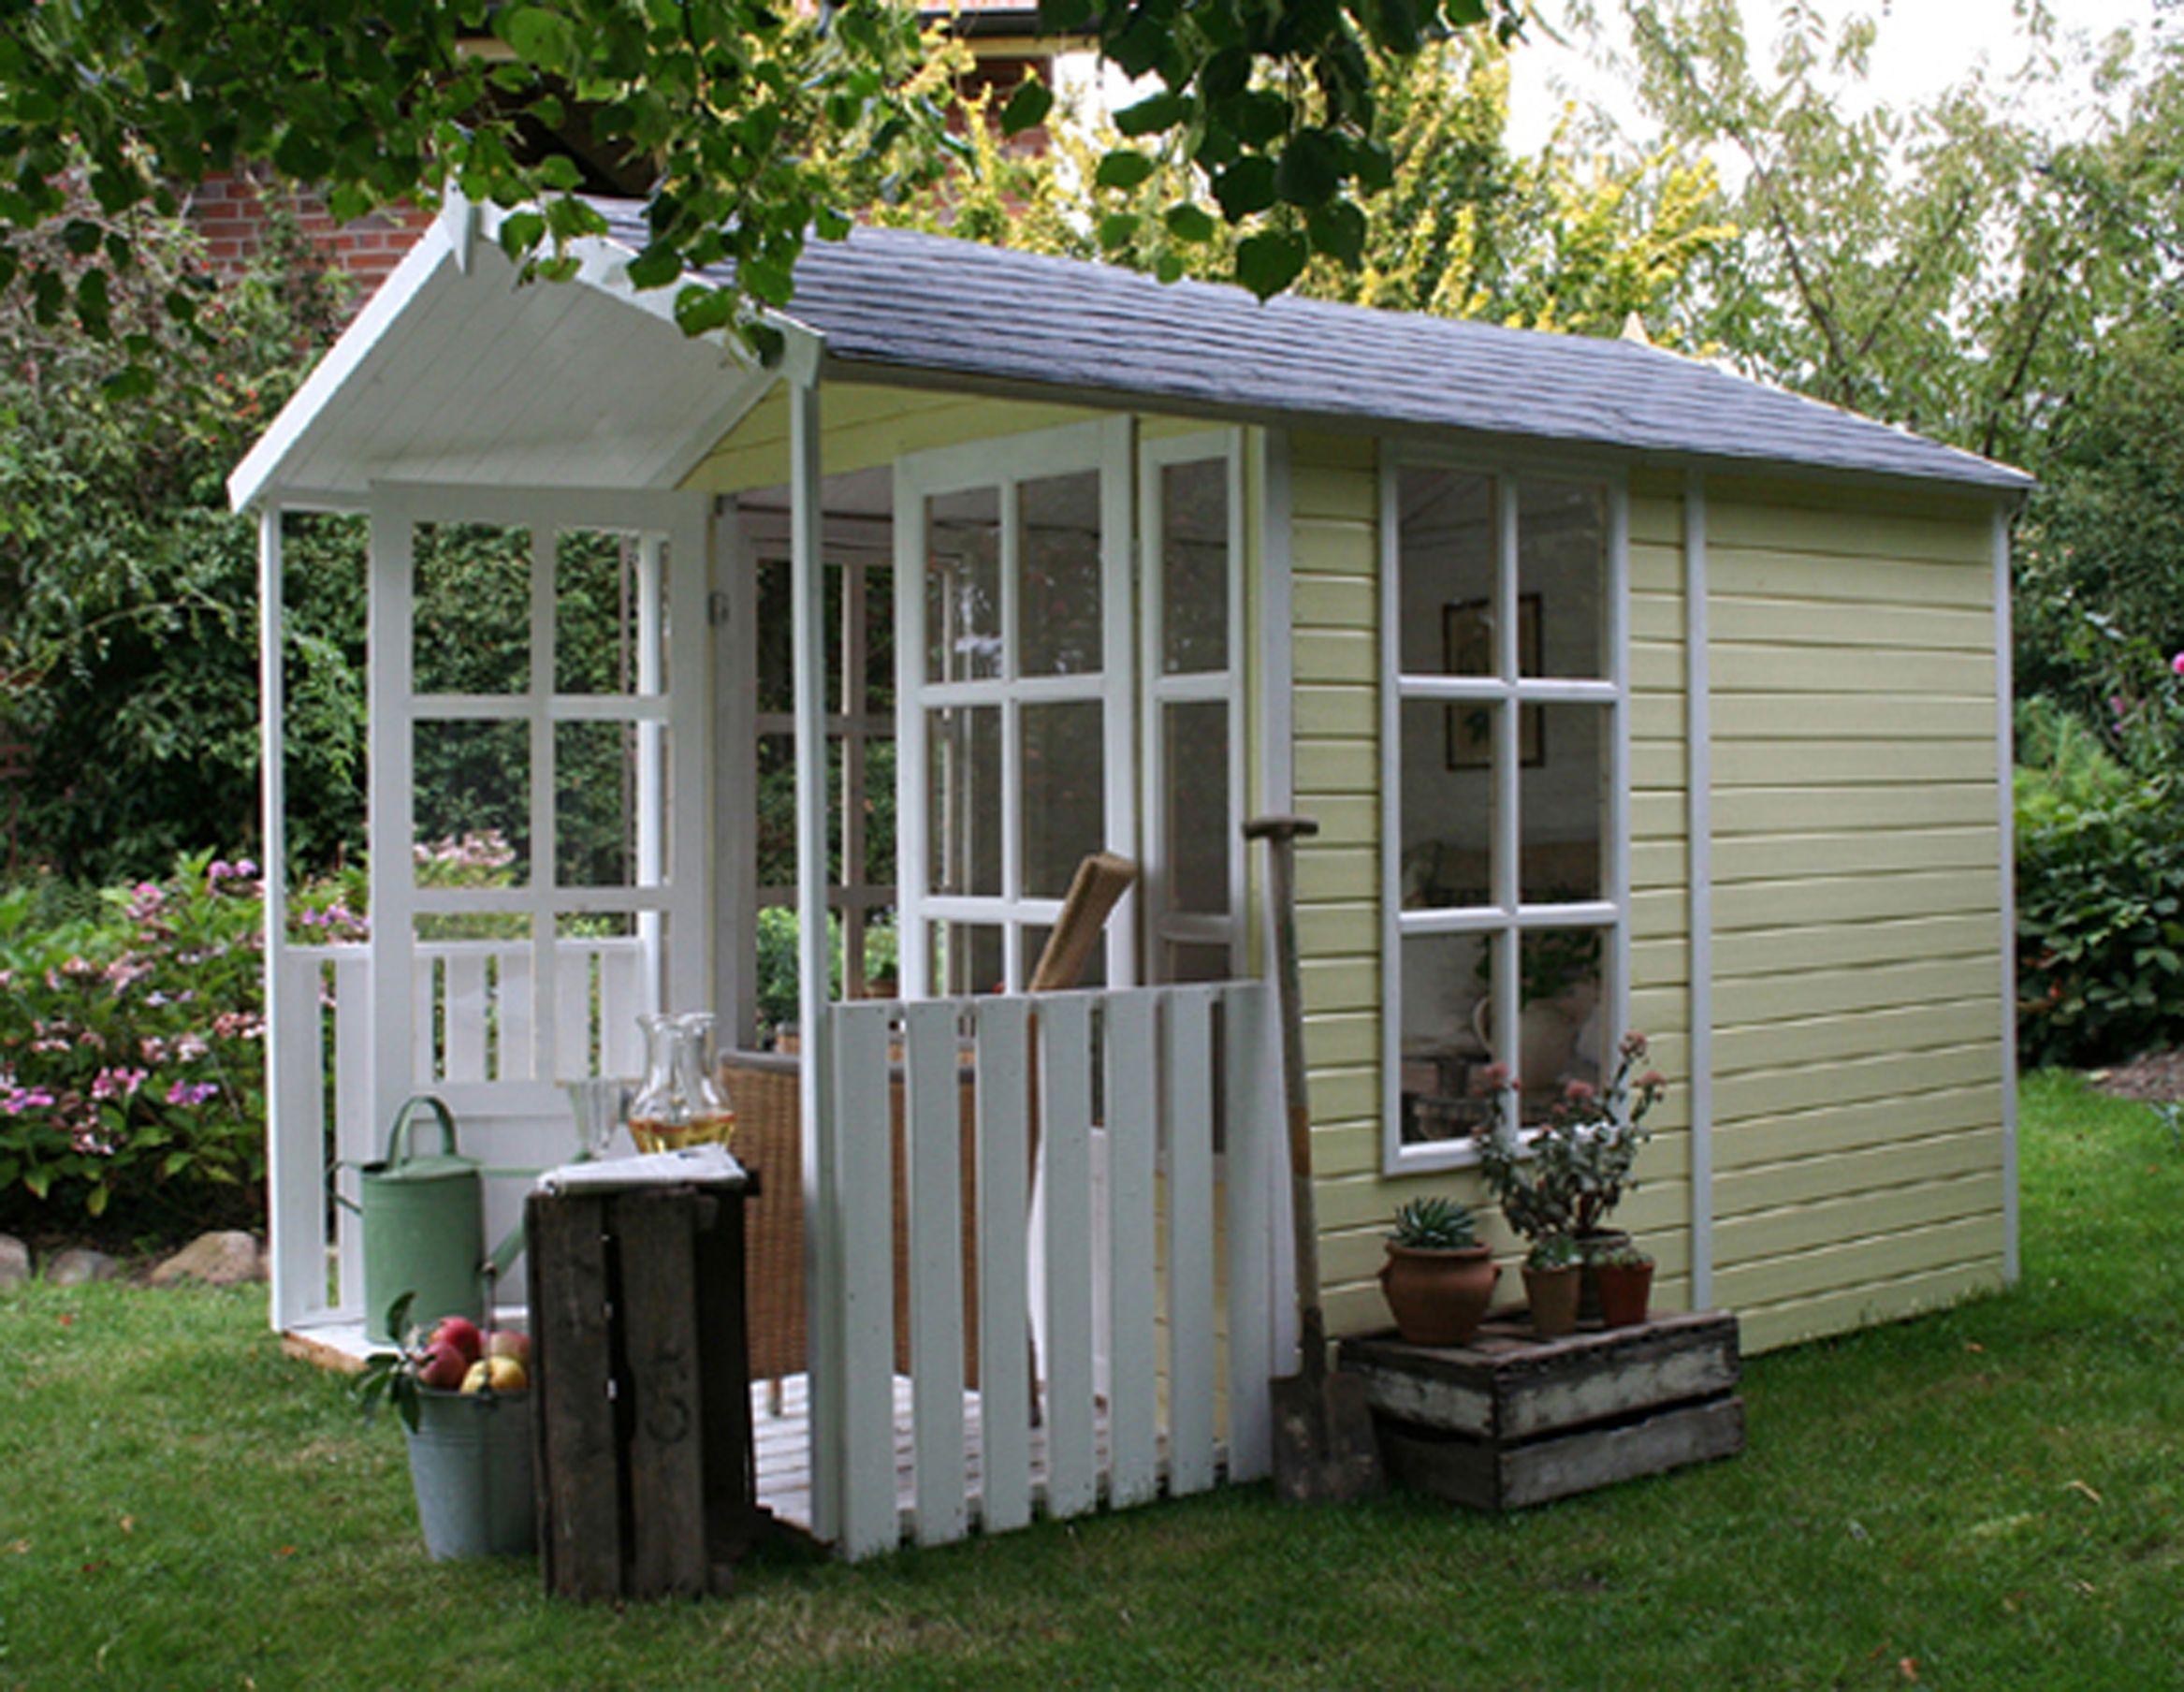 gartenhaus modell laura englische gartenh user pinterest garten gartenhaus und haus. Black Bedroom Furniture Sets. Home Design Ideas